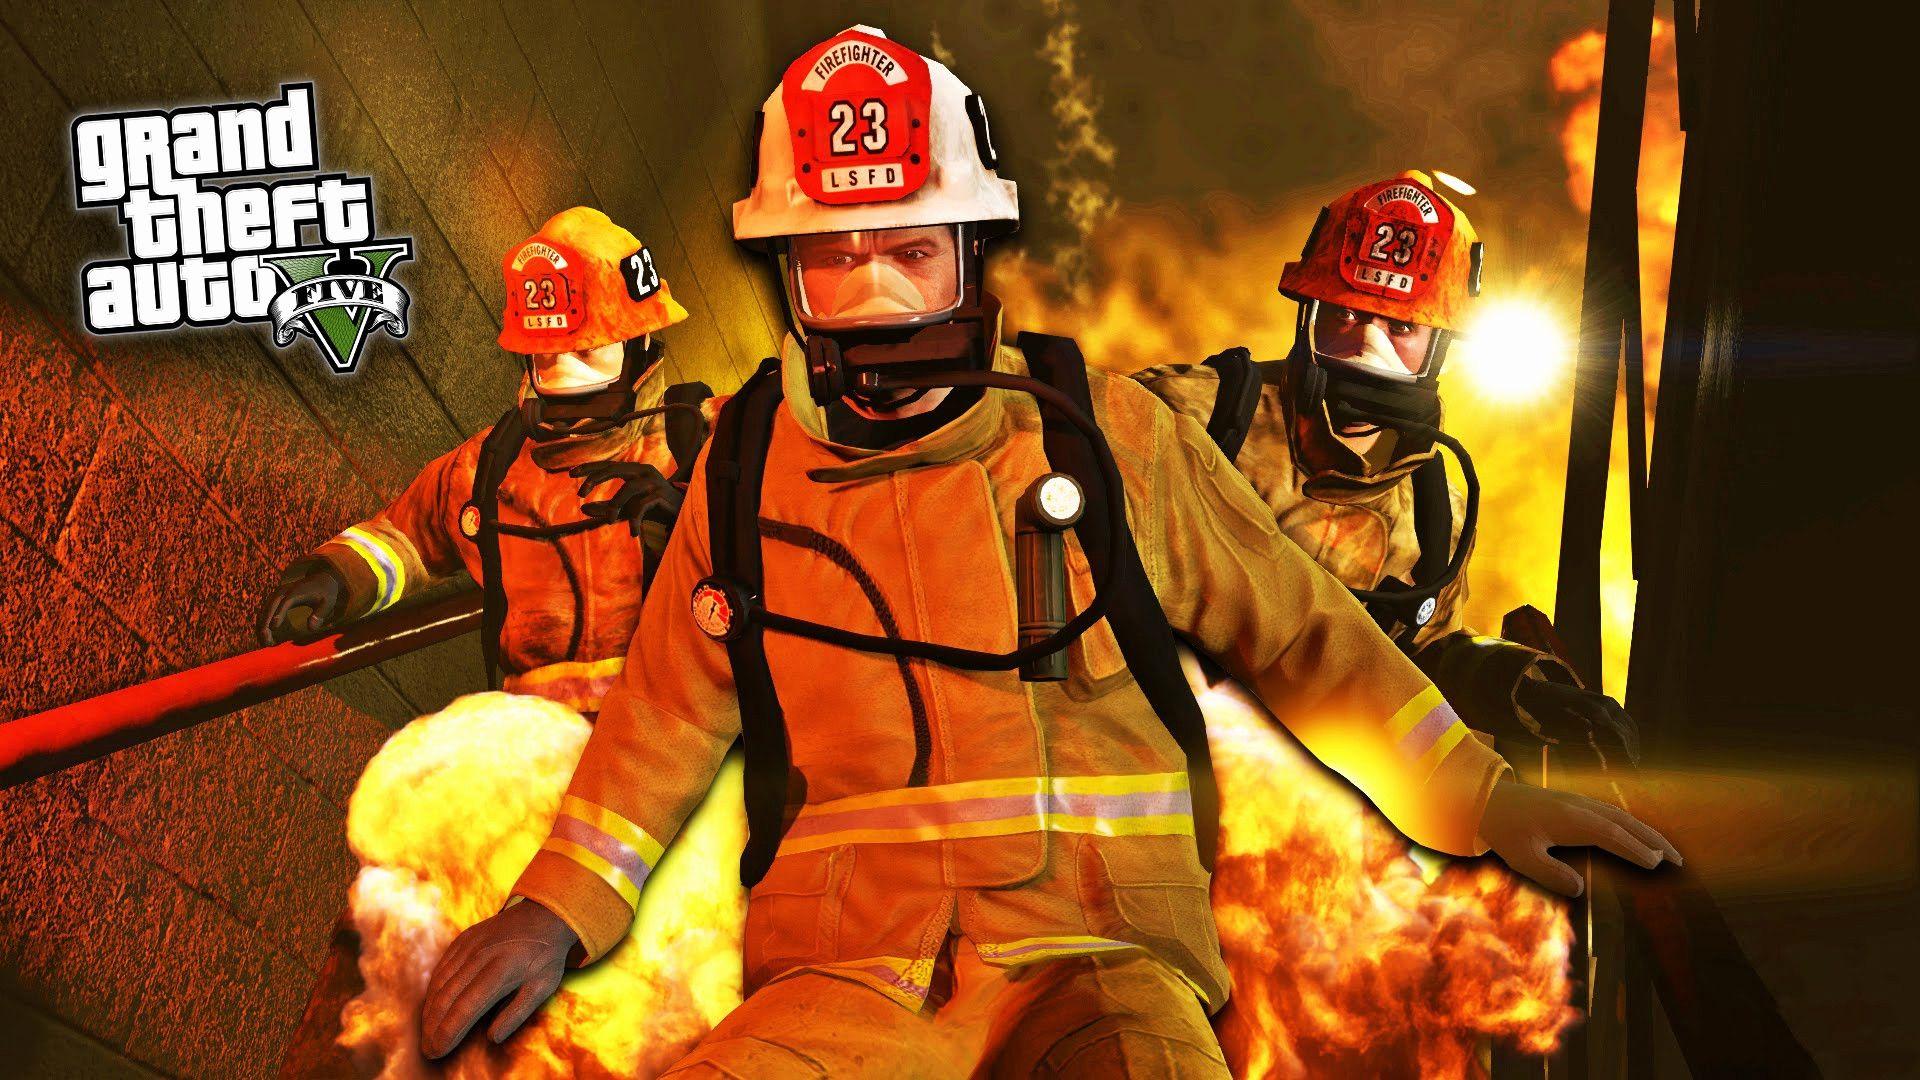 60 Hd Firefighter Wallpapers On Wallpaperplay Navy Seal Wallpaper Fireman Firefighter